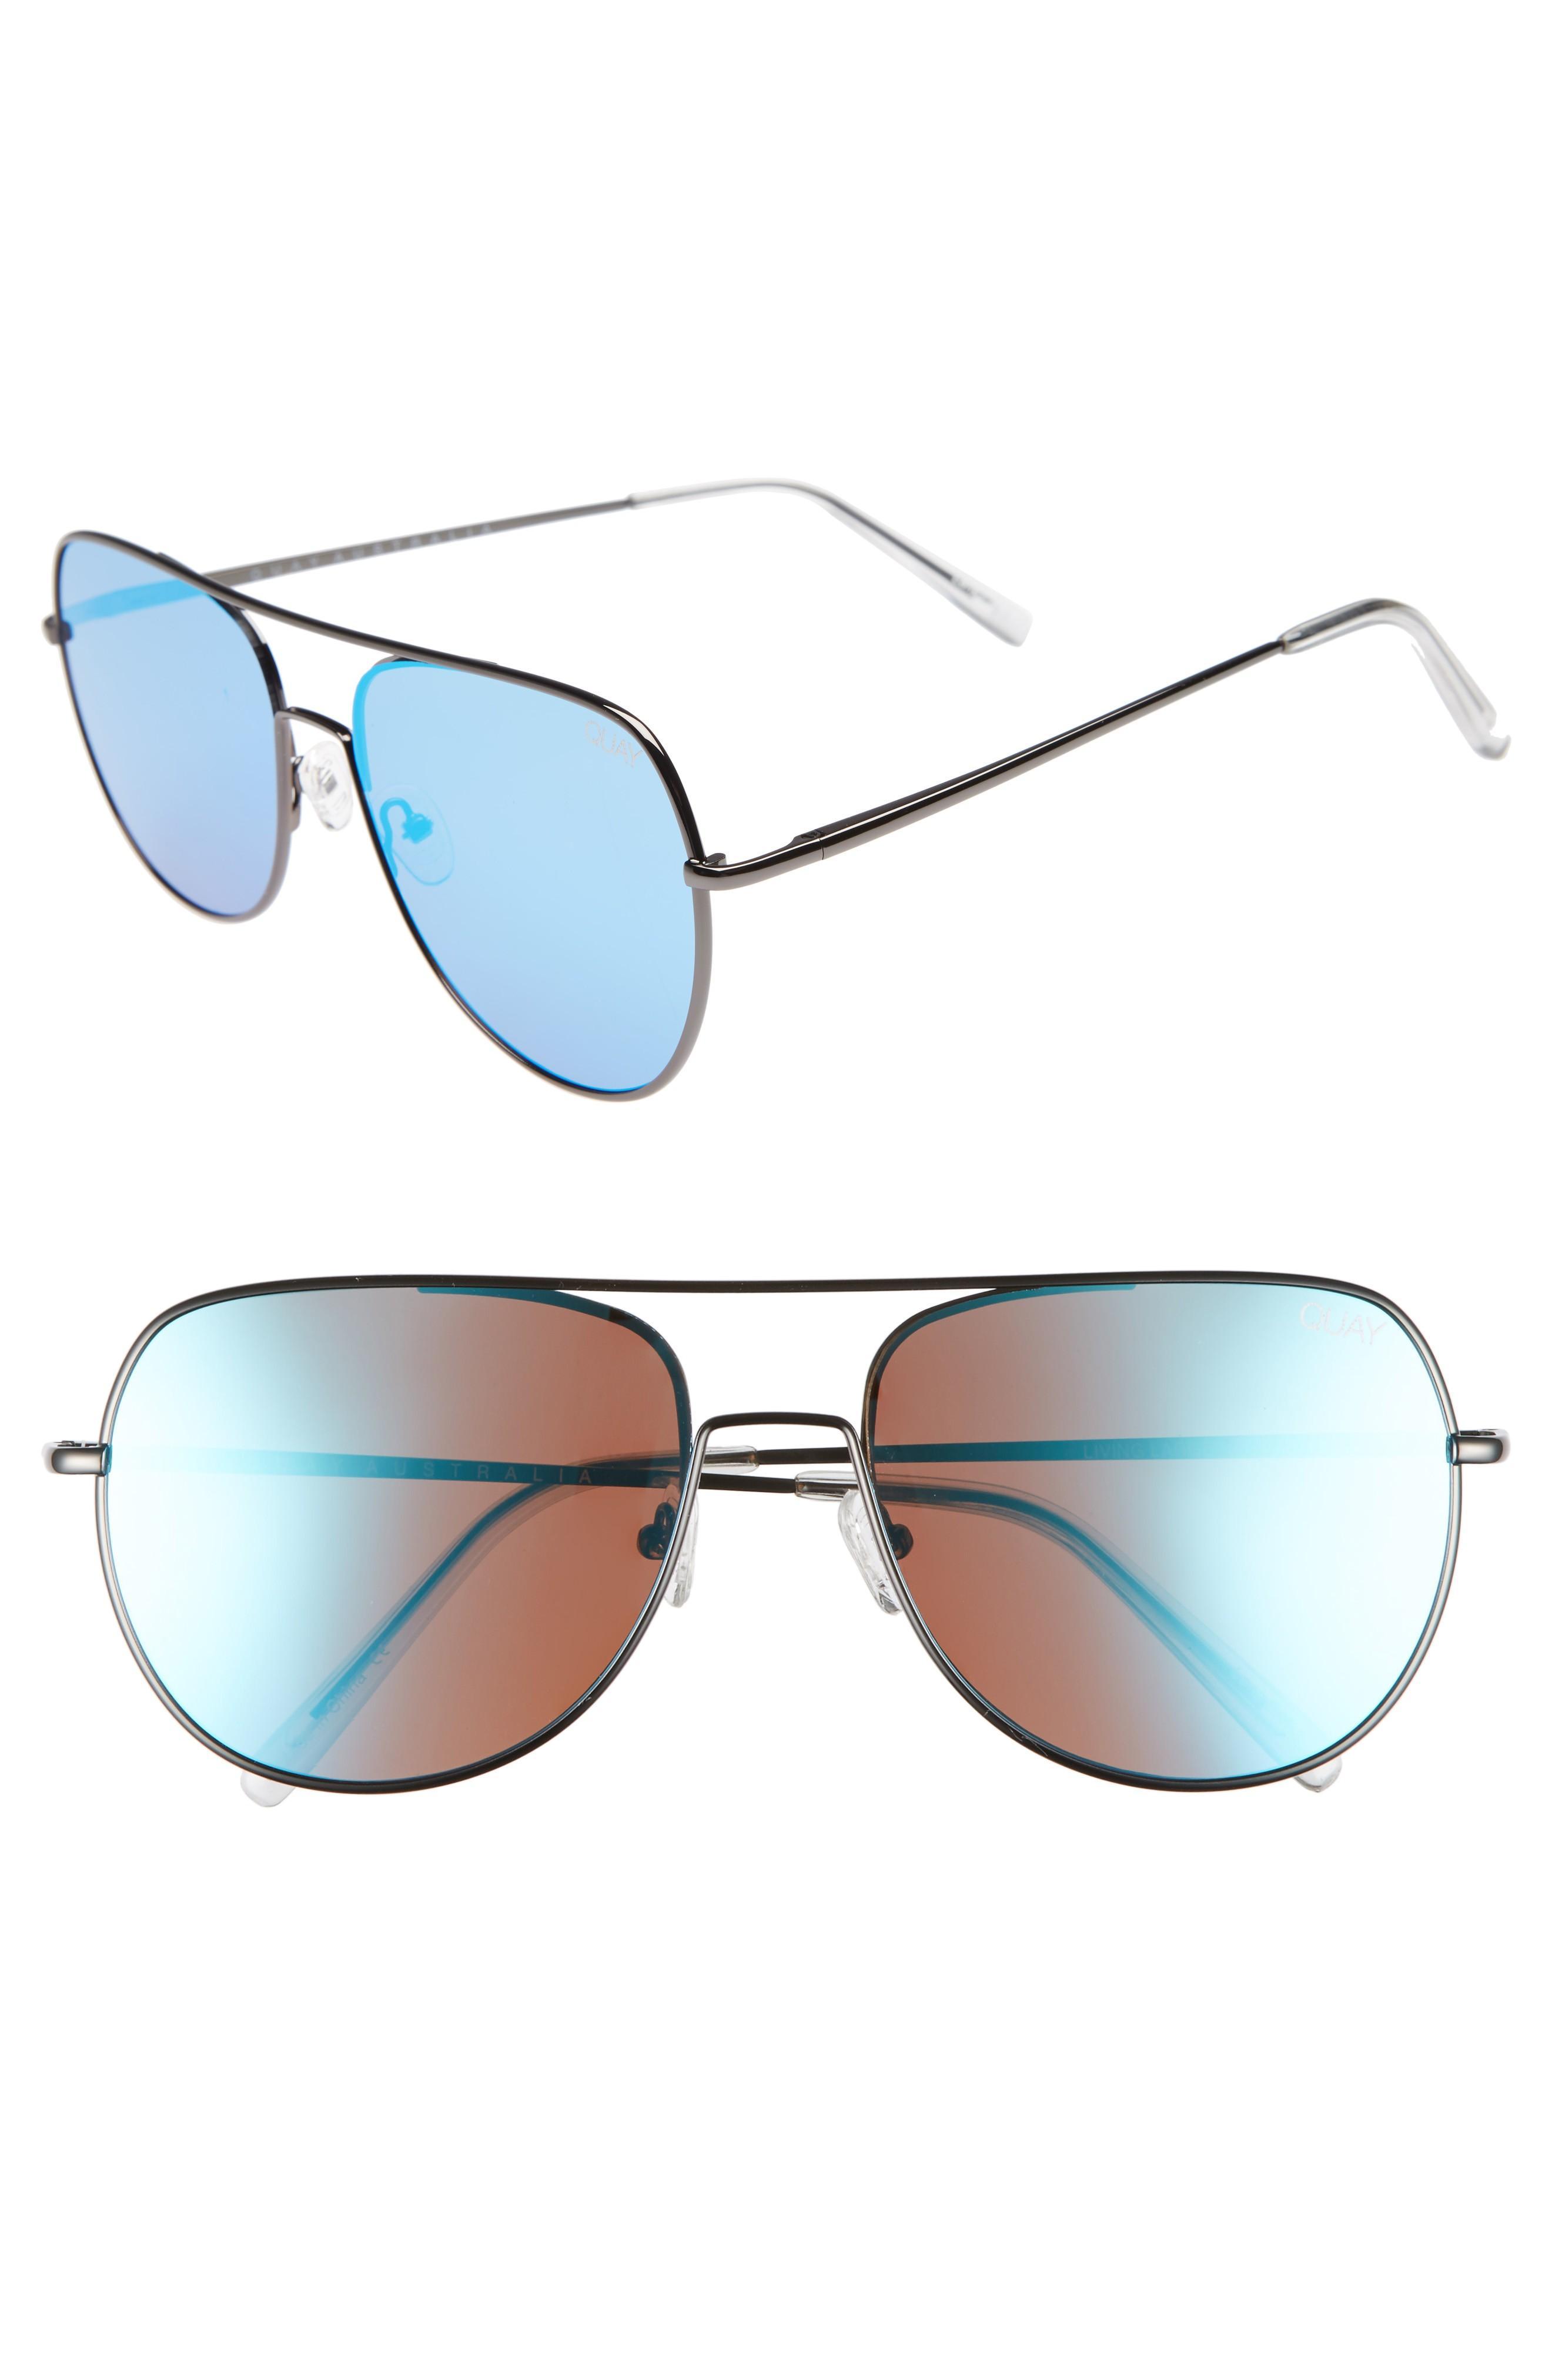 03d7f43943 Quay Living Large 58Mm Aviator Sunglasses - Dark Grey Blue